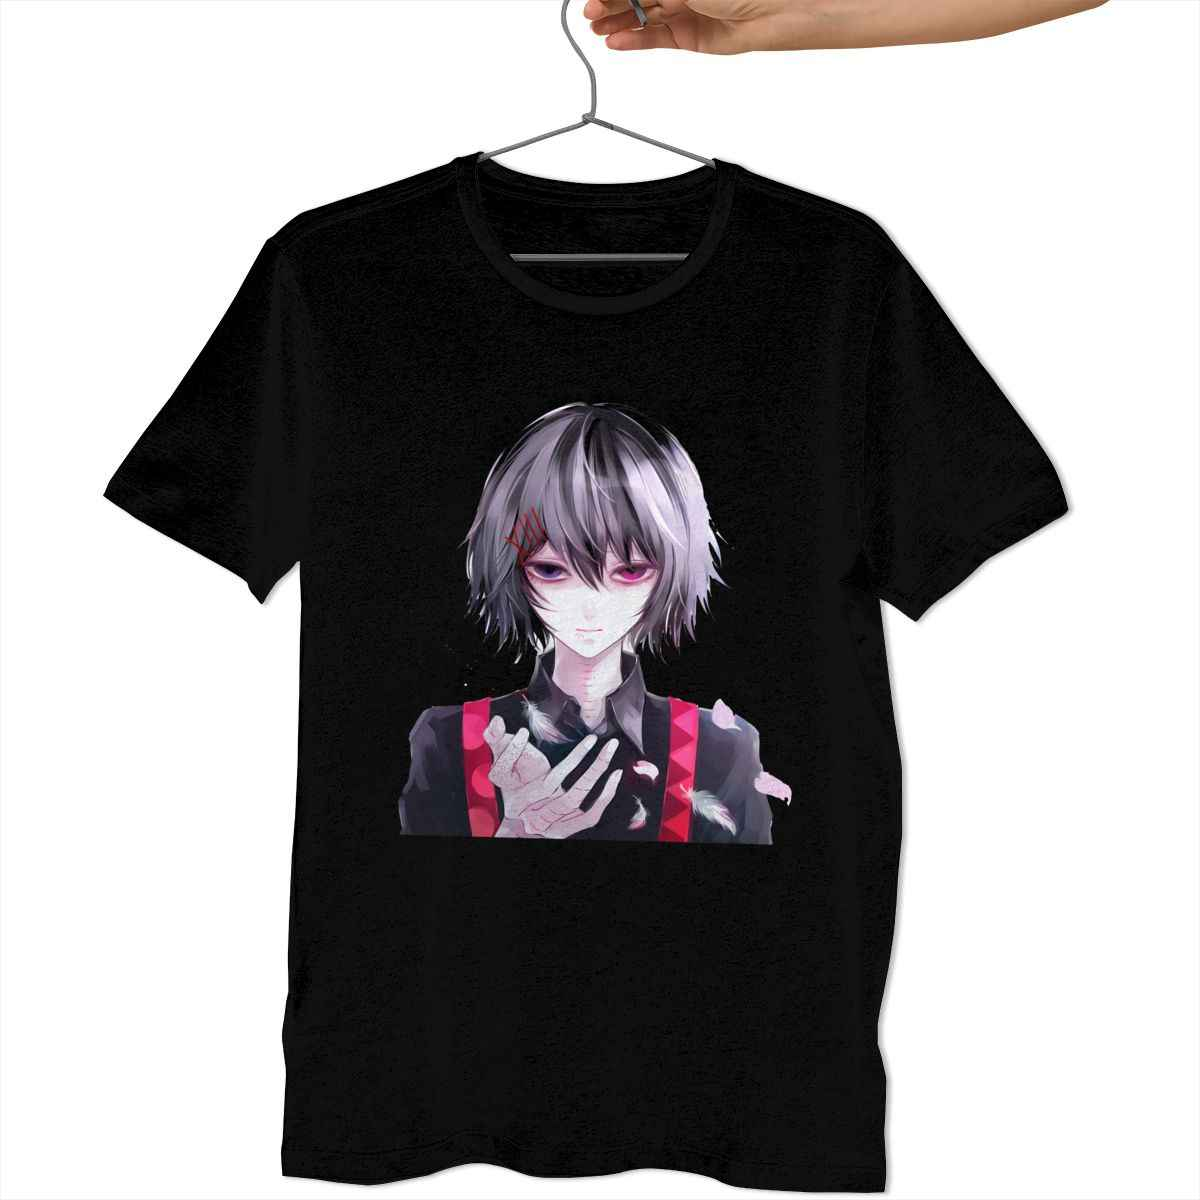 REI Big EyE Black T-Shirt COS Tee Short Sleeve Anime Tokyo Ghoul JUZO SUZUYA